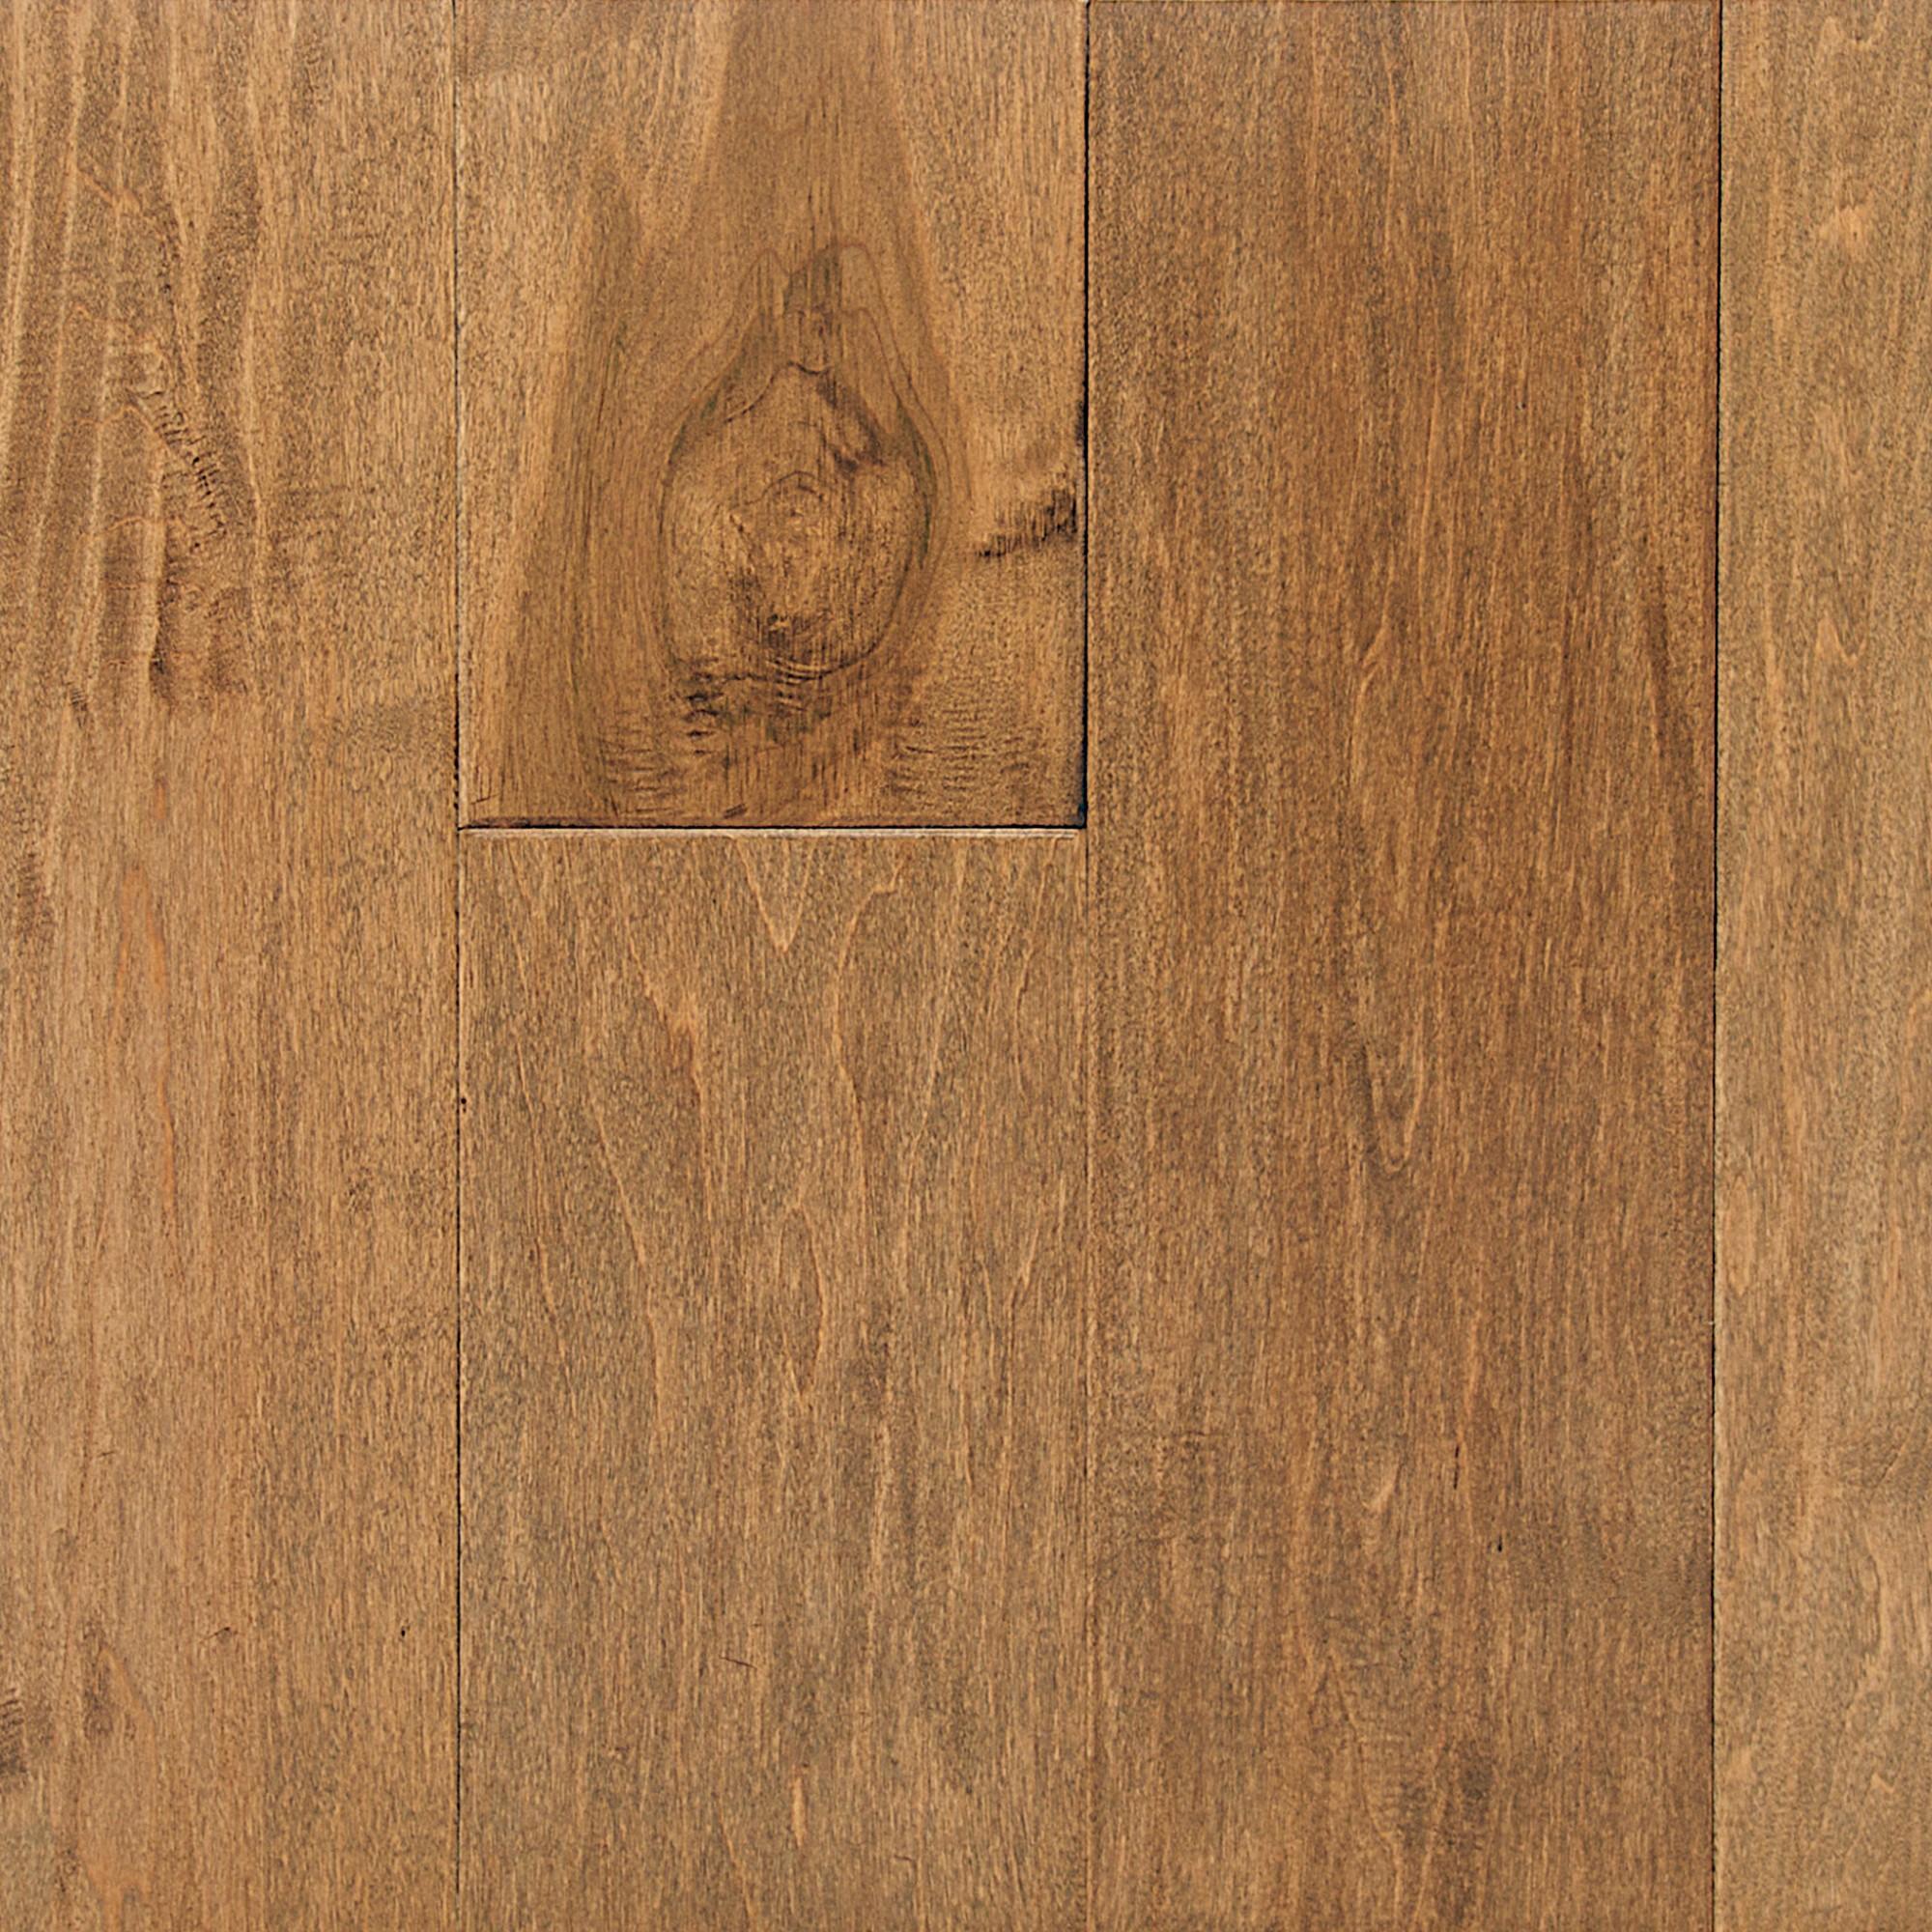 Hand Scraped Maple Oxford Vintage Hardwood Flooring